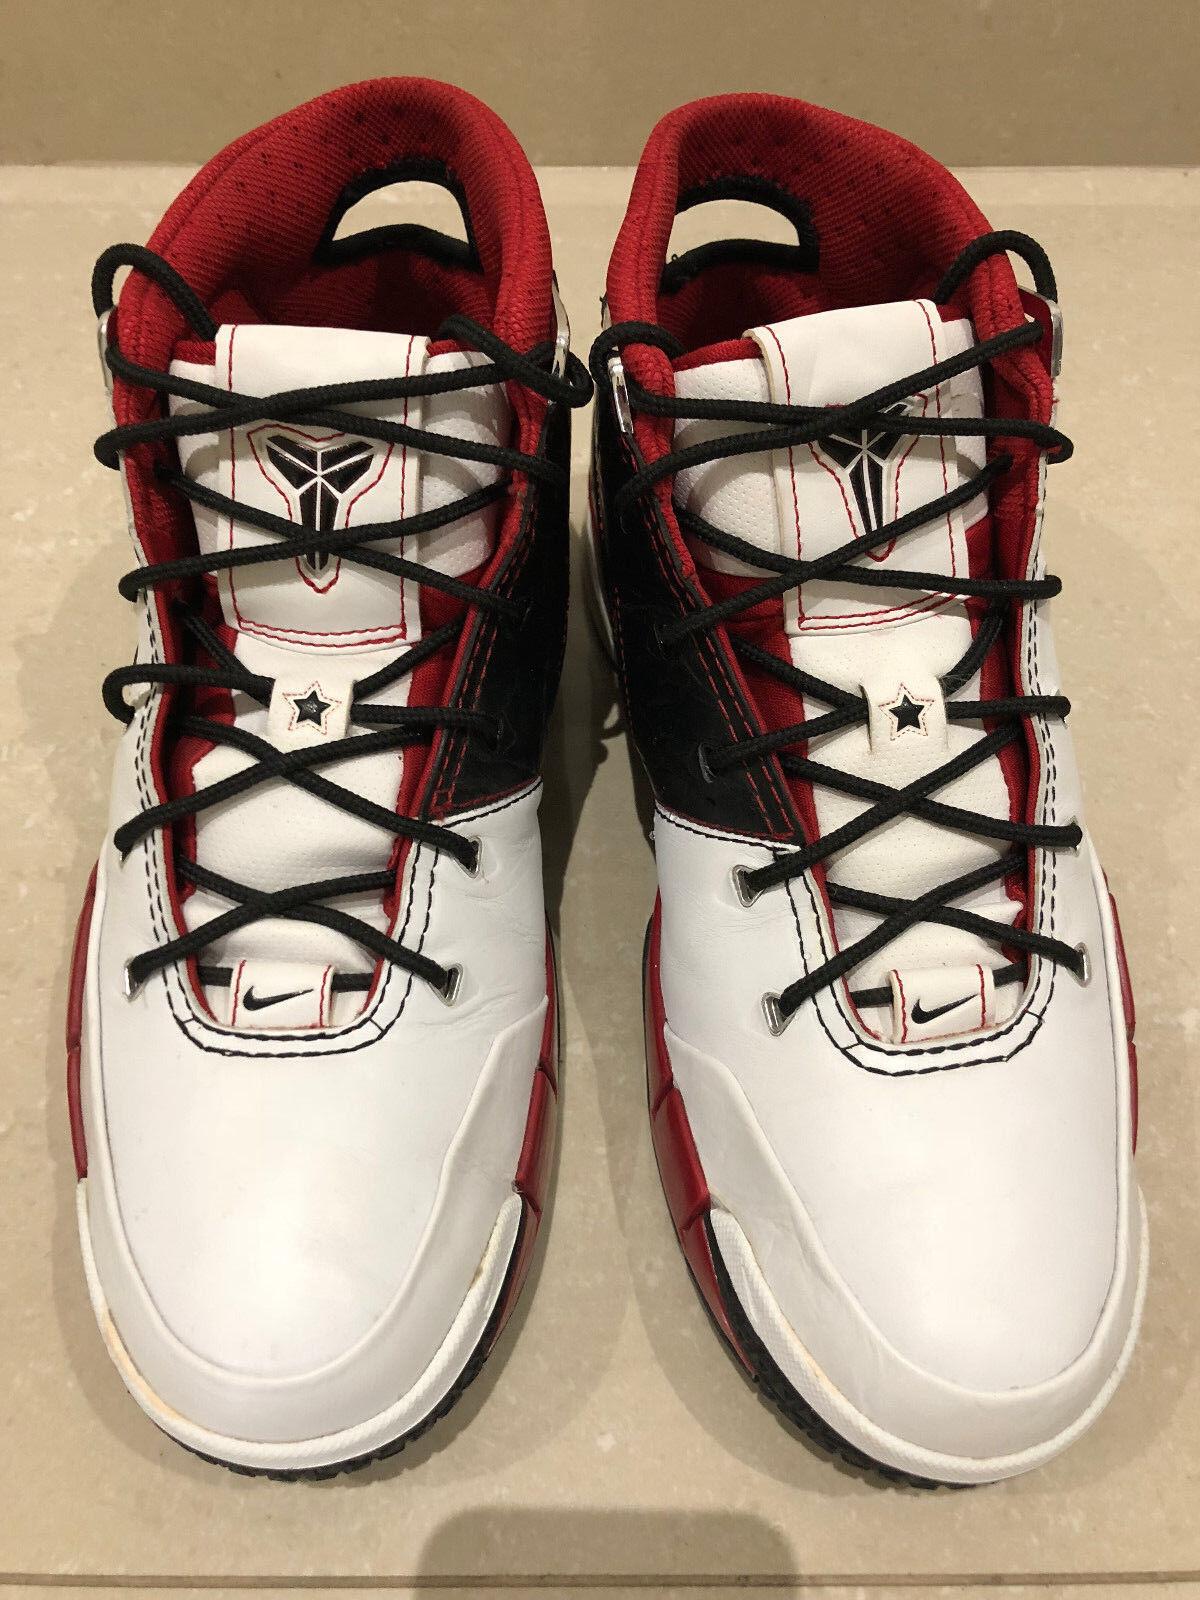 Nike Zoom Kobe 1 All Star White Black Varsity Red Sz 11 US Mens Kyrie LeBron